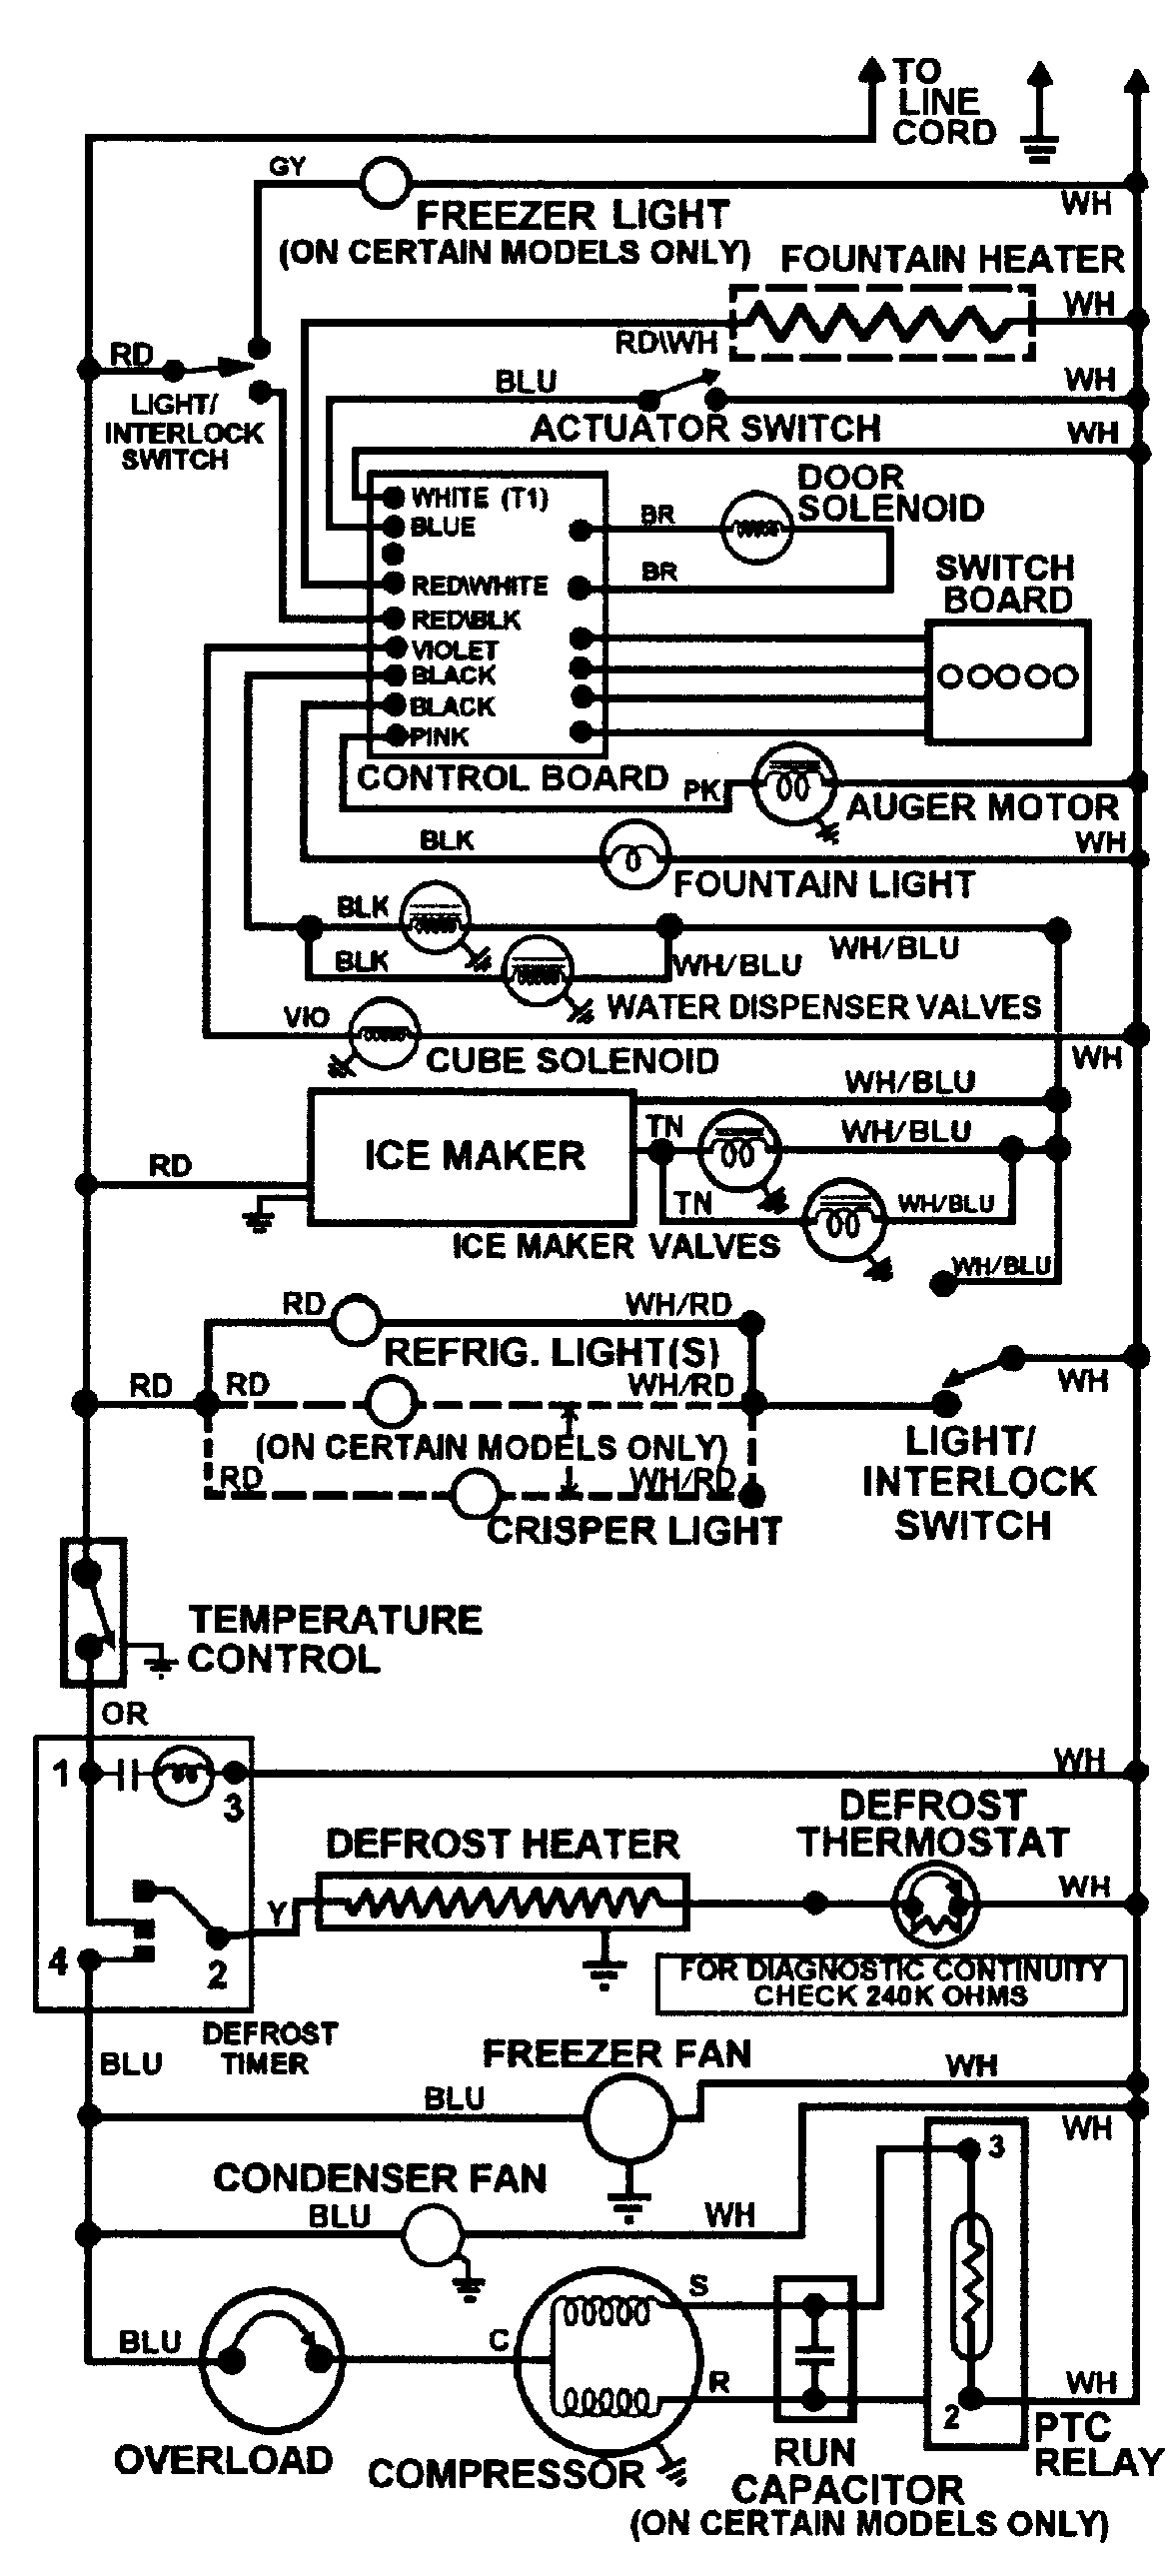 Maytag  Refrigerator  Wiring information